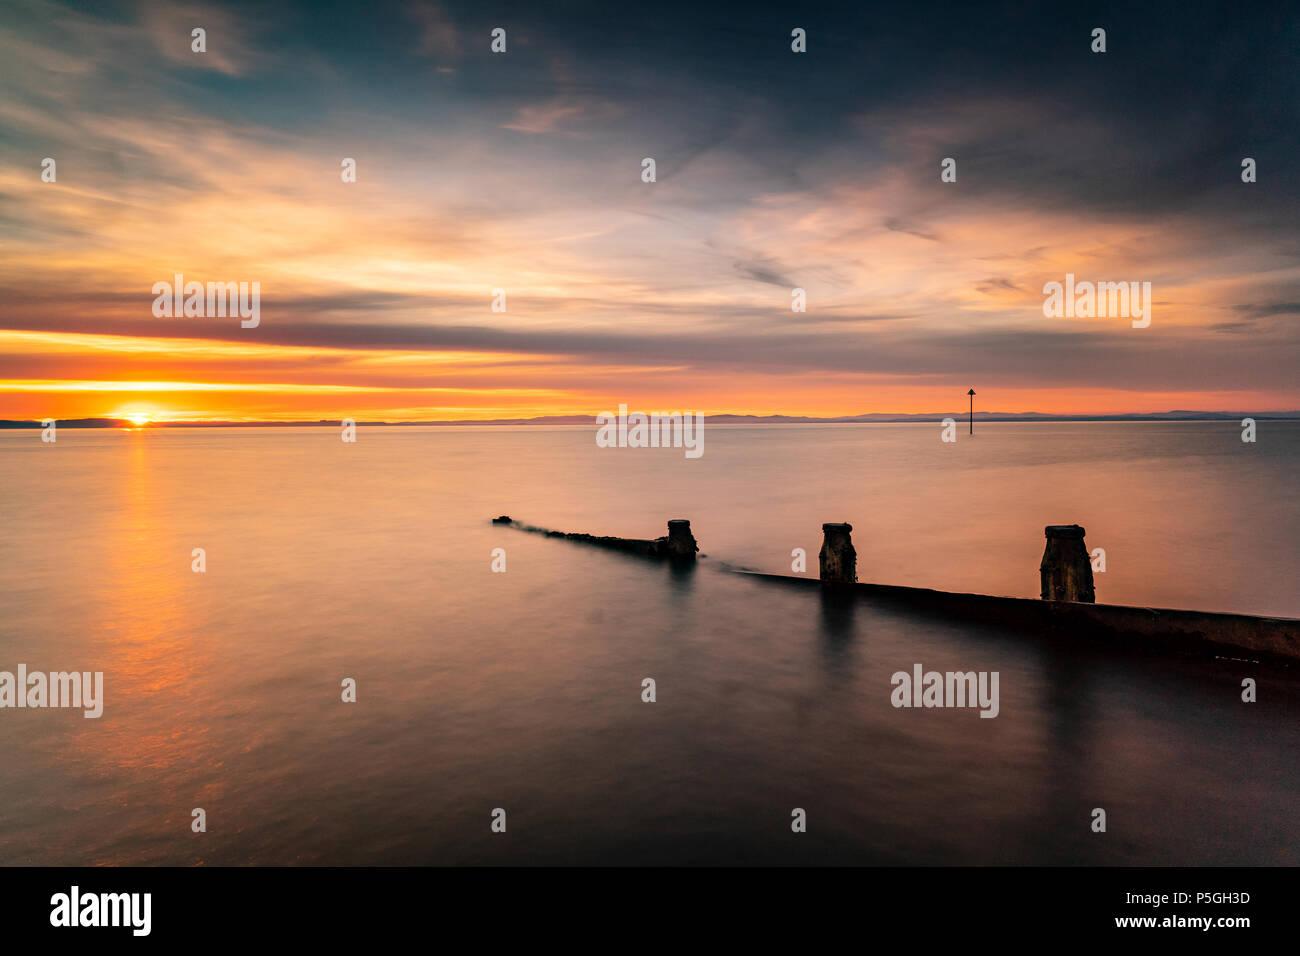 Silloth Sunset, Cumbria. - Stock Image